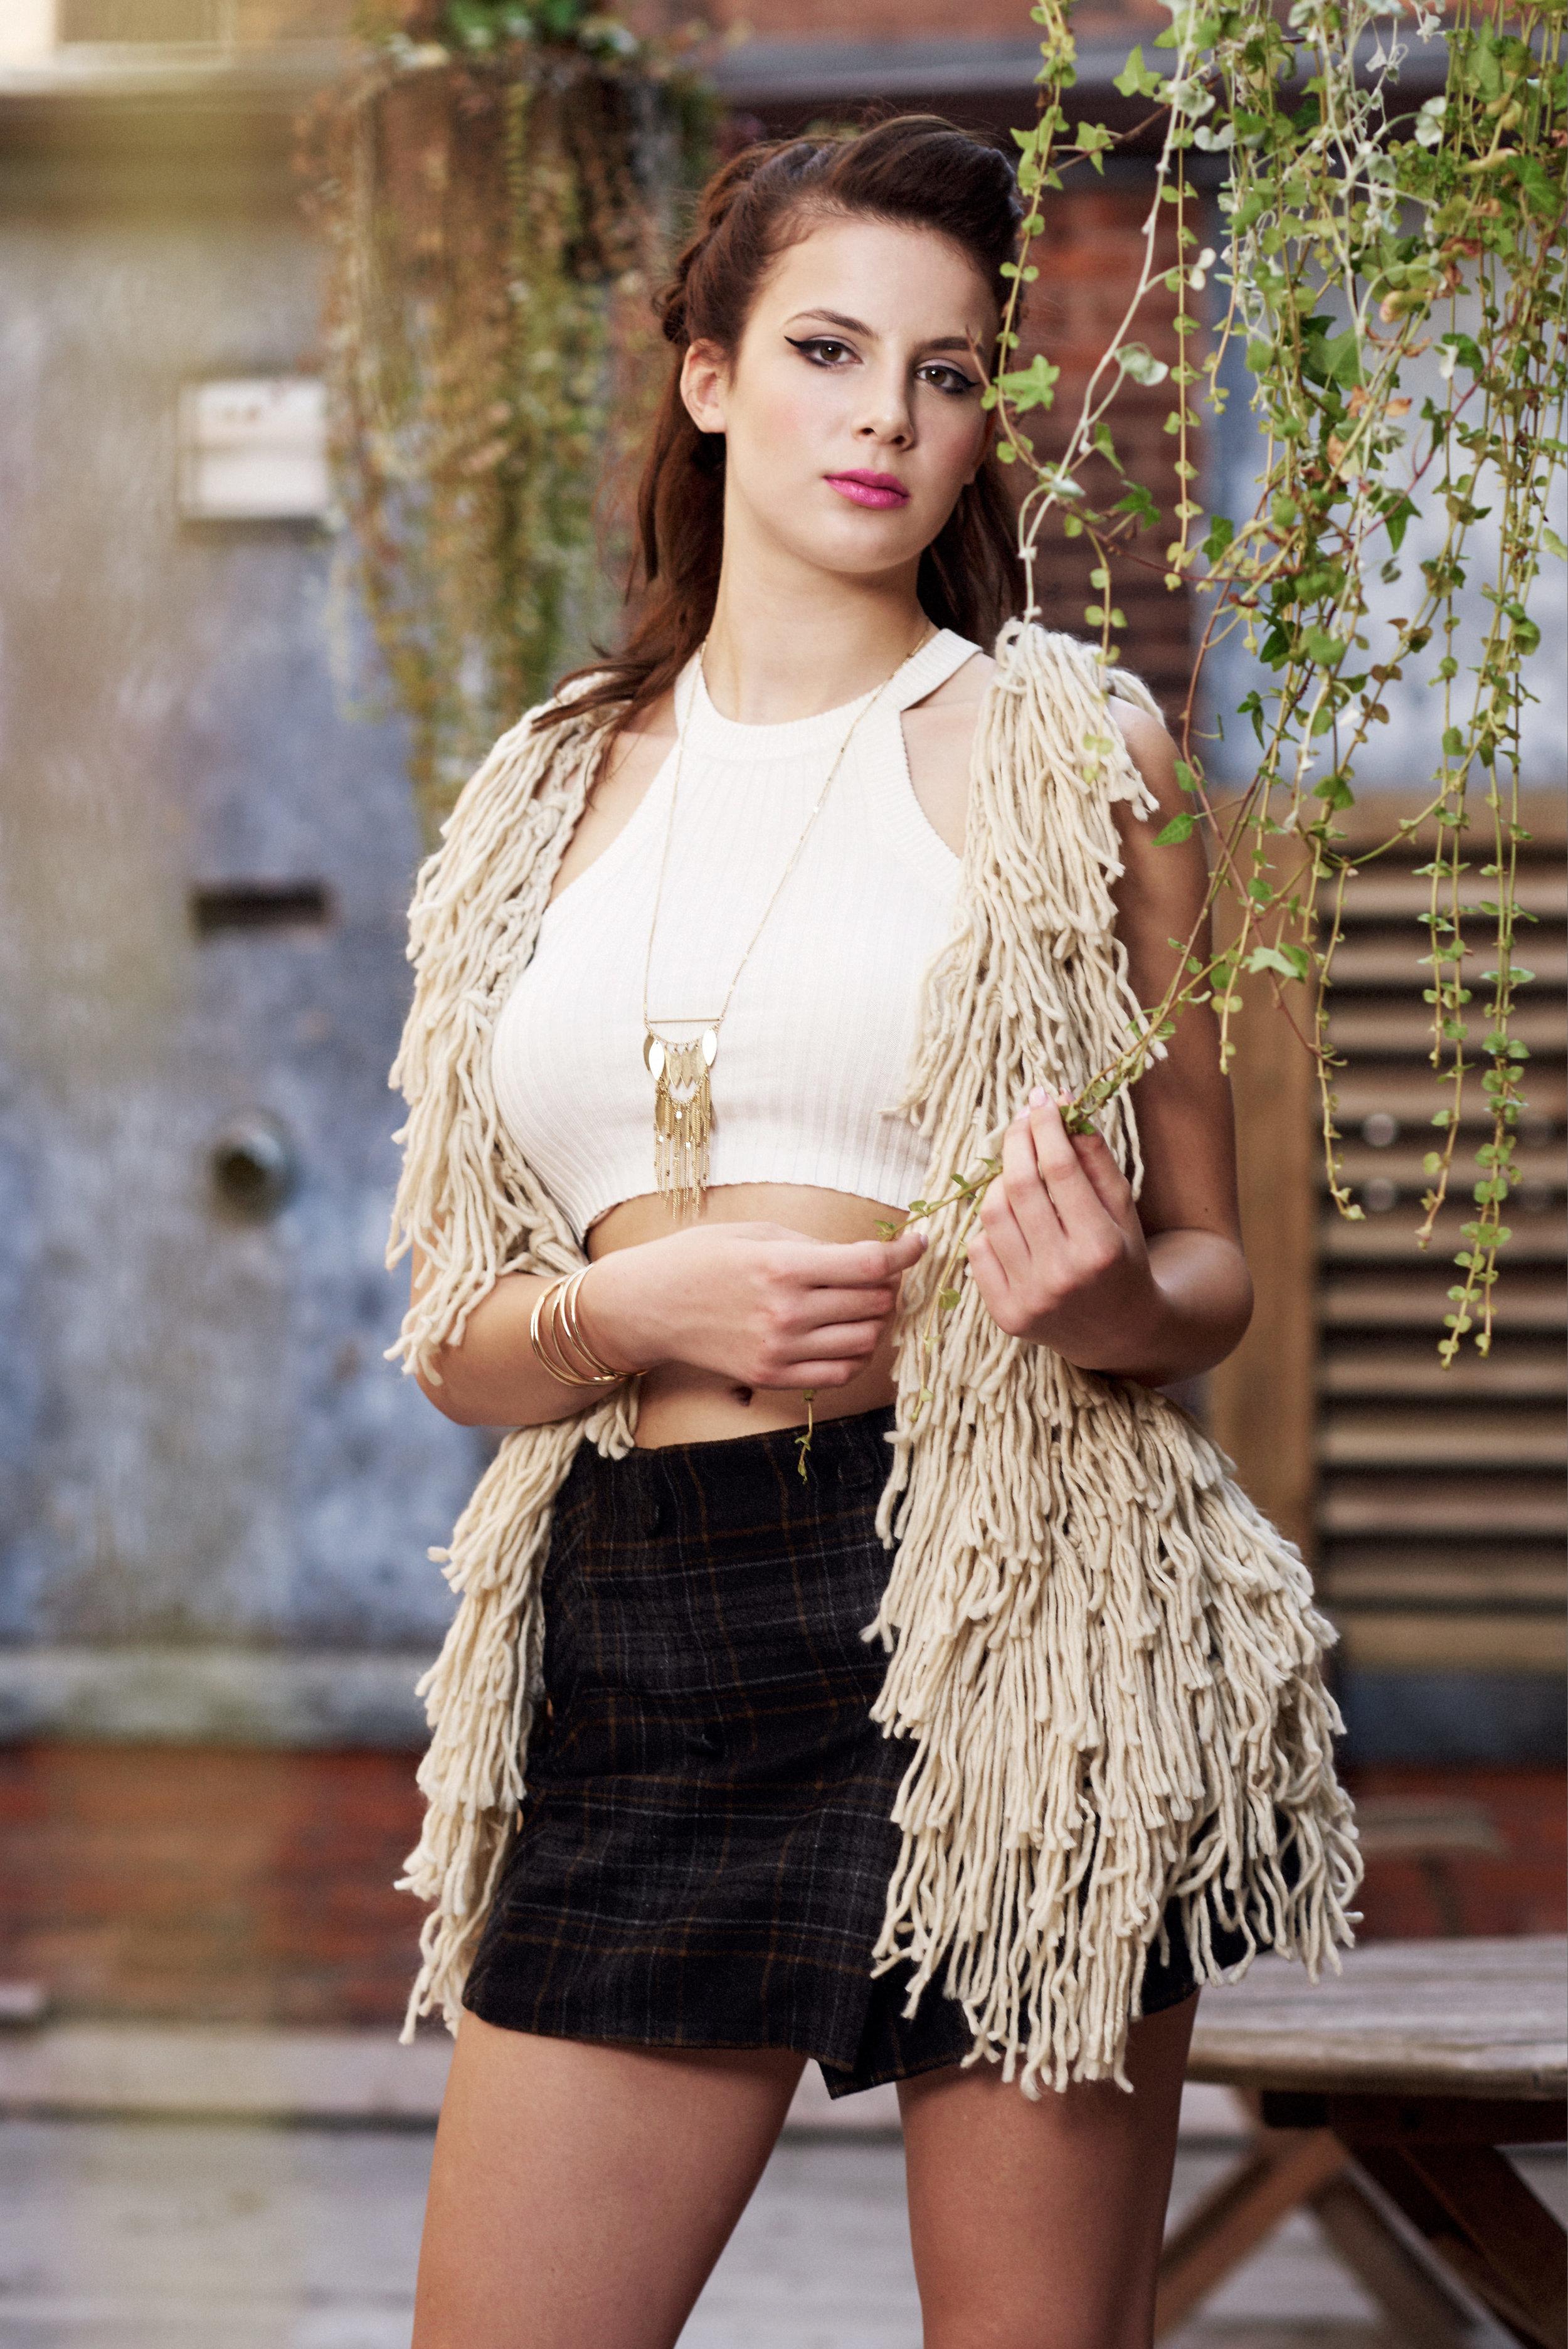 Marta-Hewson-Savannah-D'Amico-Model-Portfolio-42941.jpg